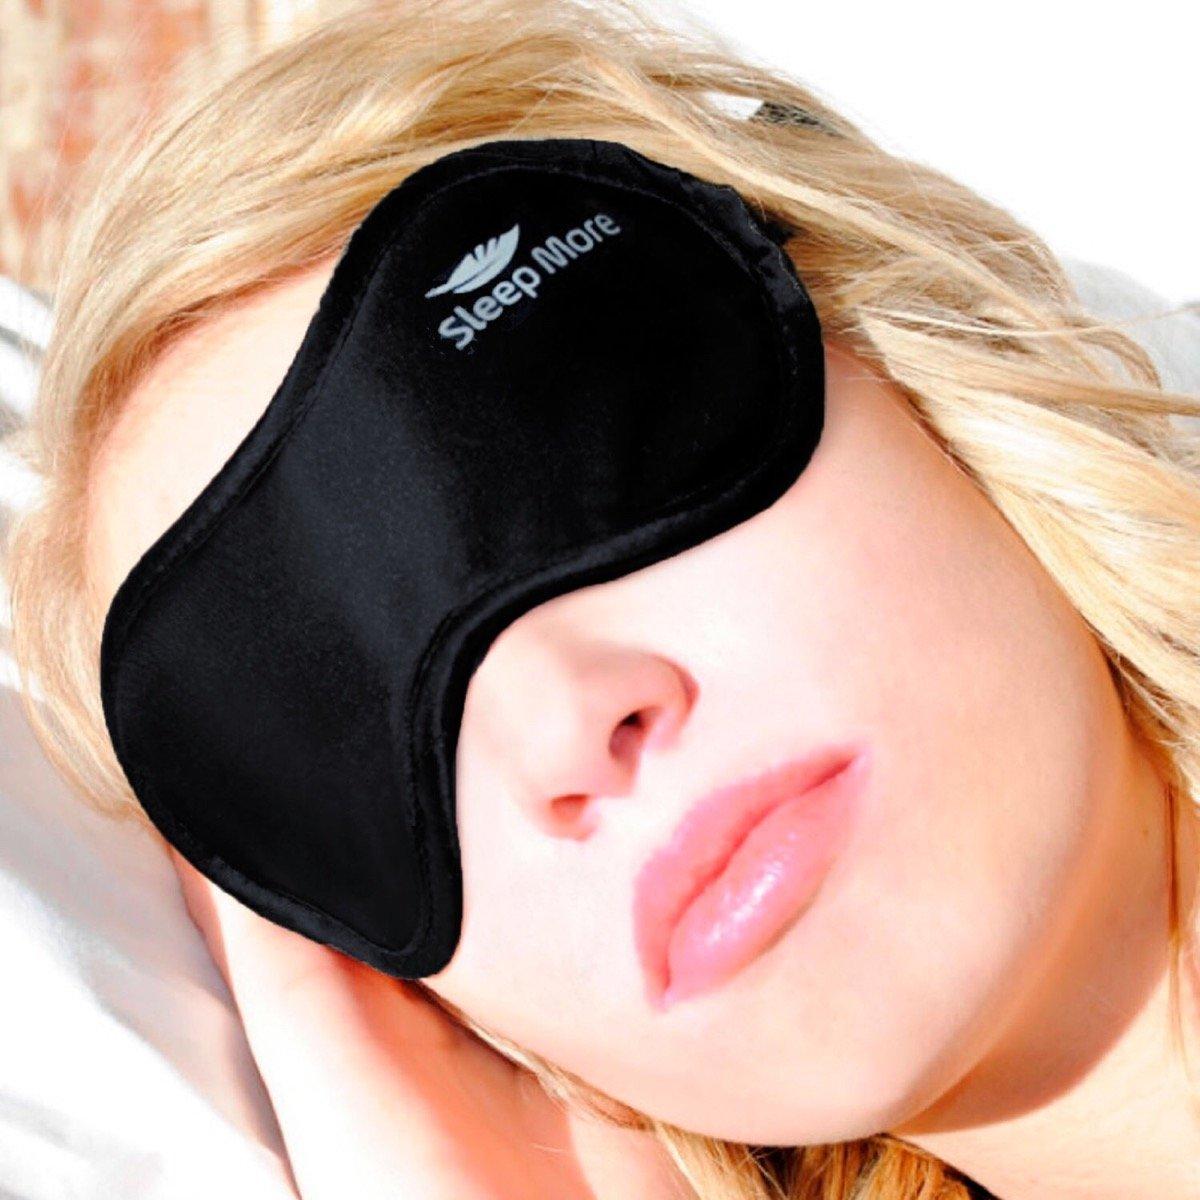 Sleep Mask Large Xl Size Sleeping Mask For Men Or Women